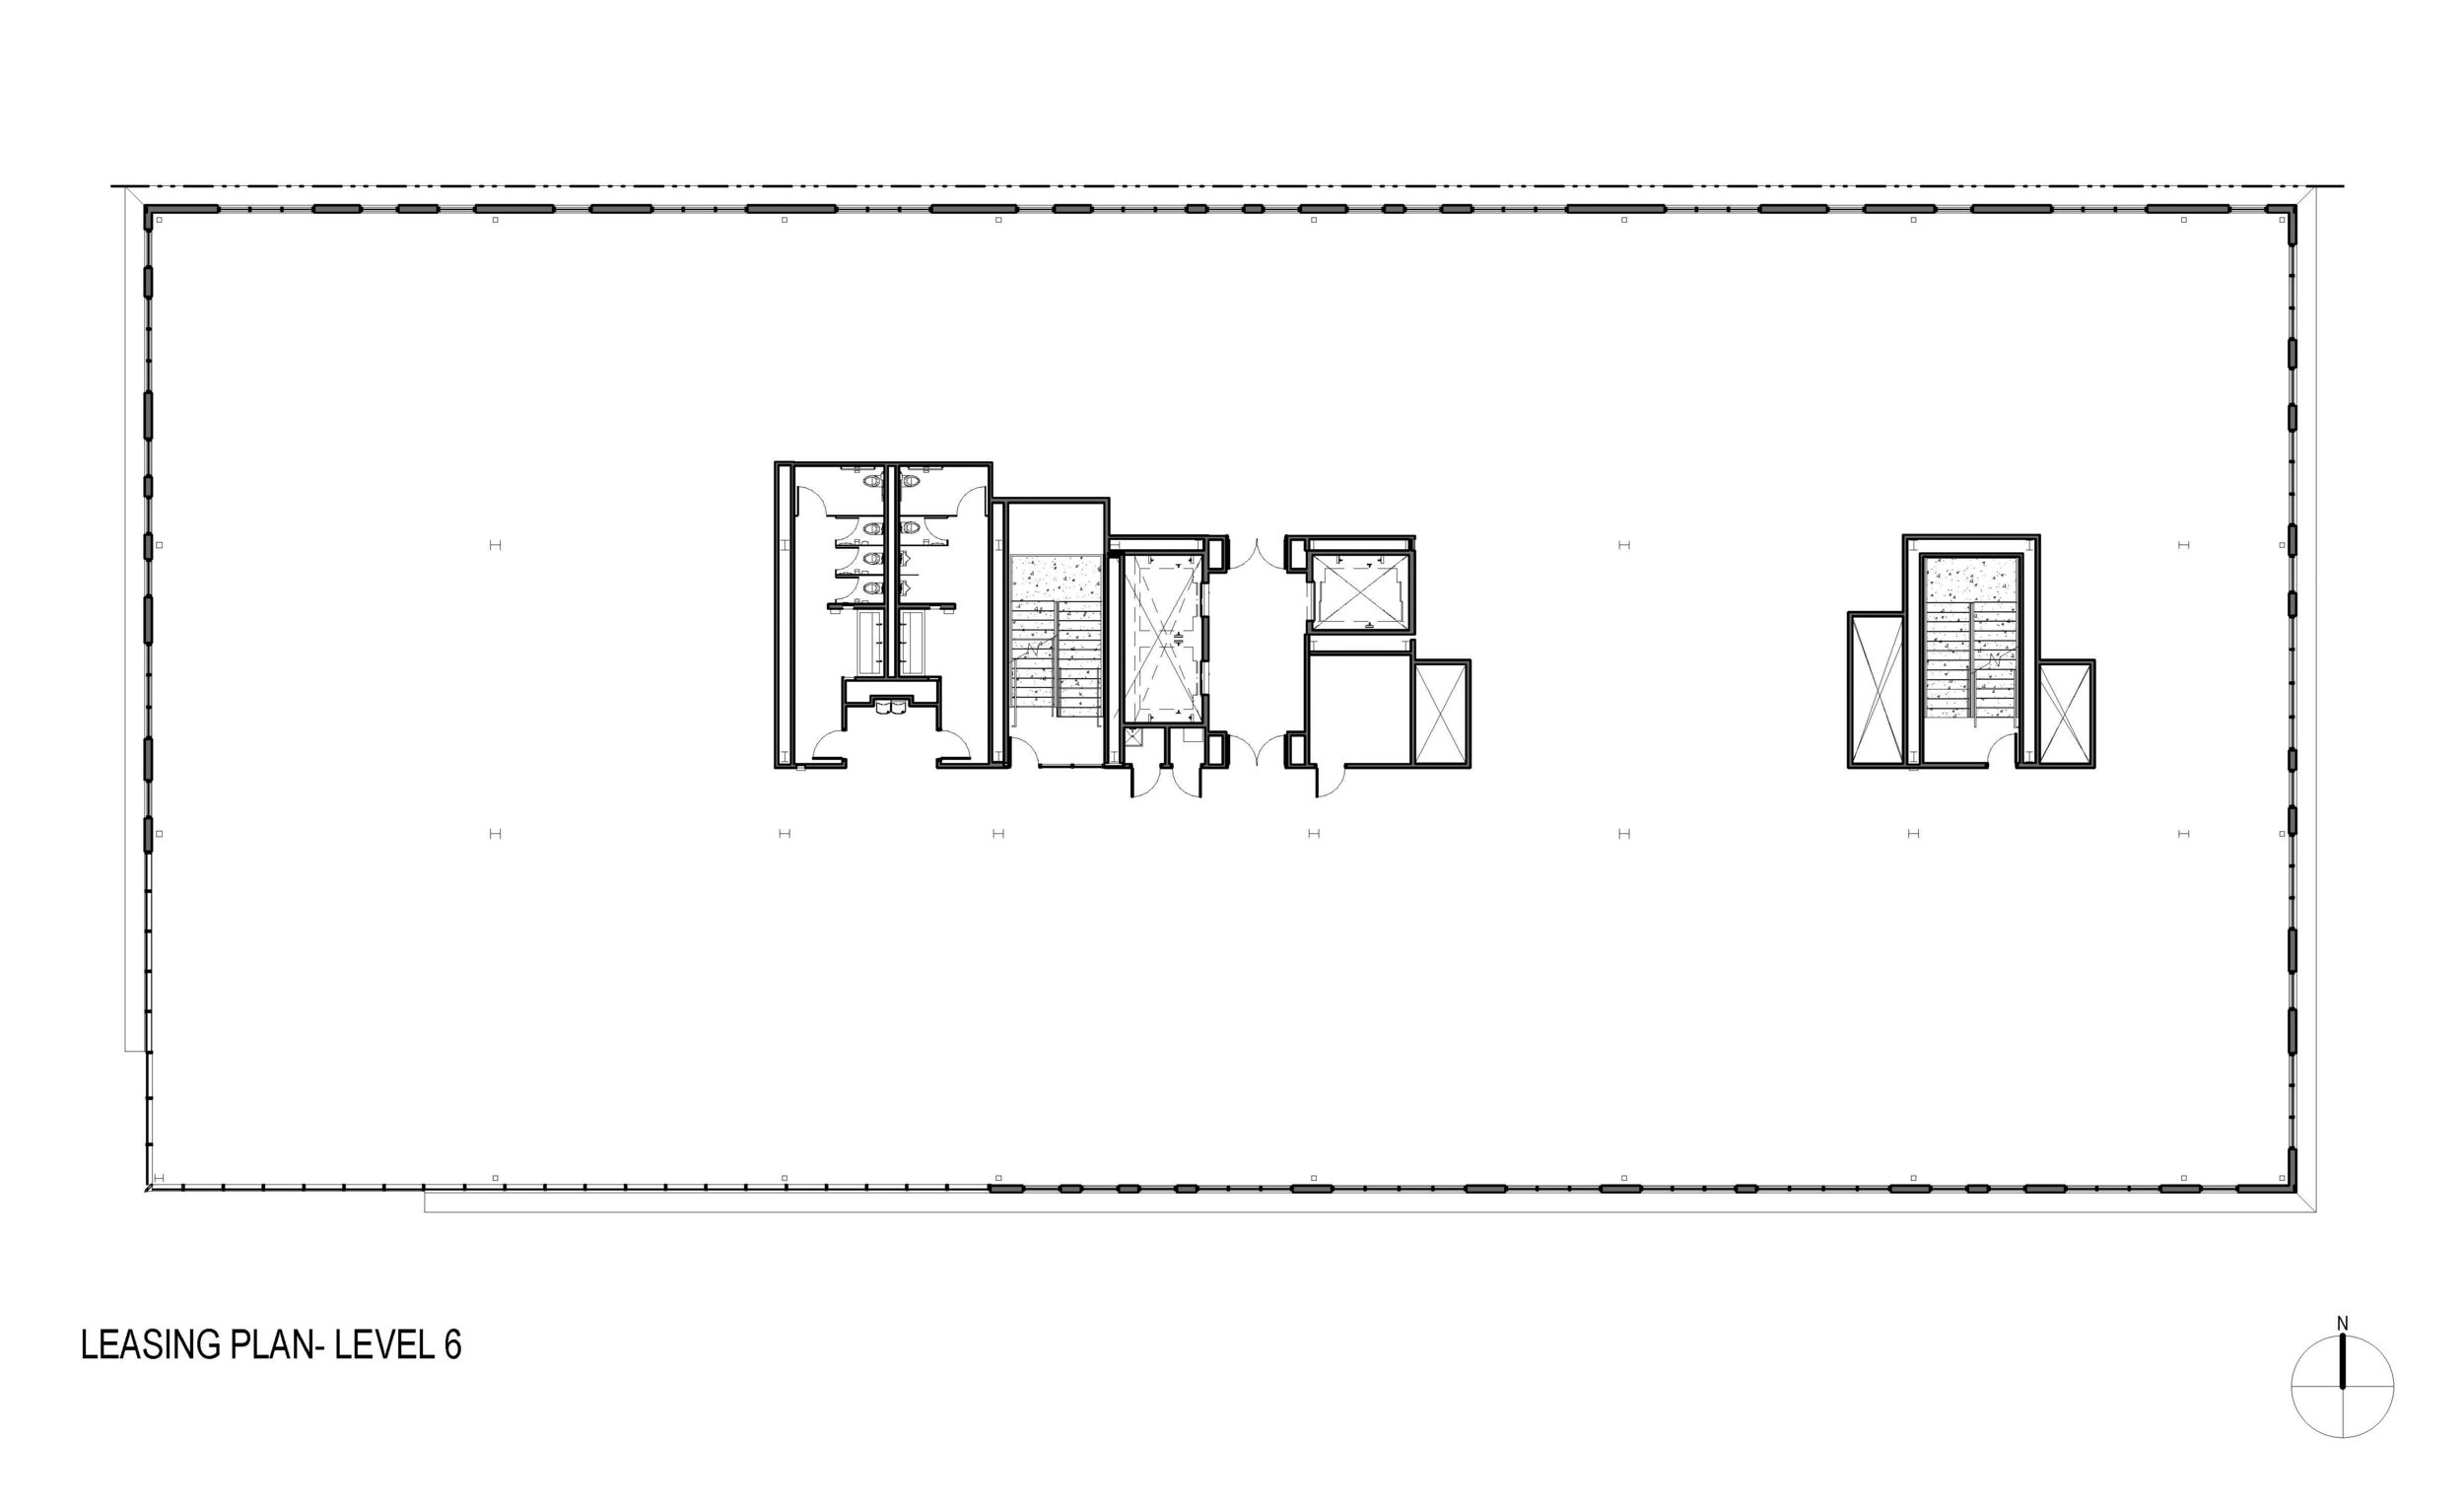 Catalyst-6th Floor Leasing Study 3.31.17.jpg